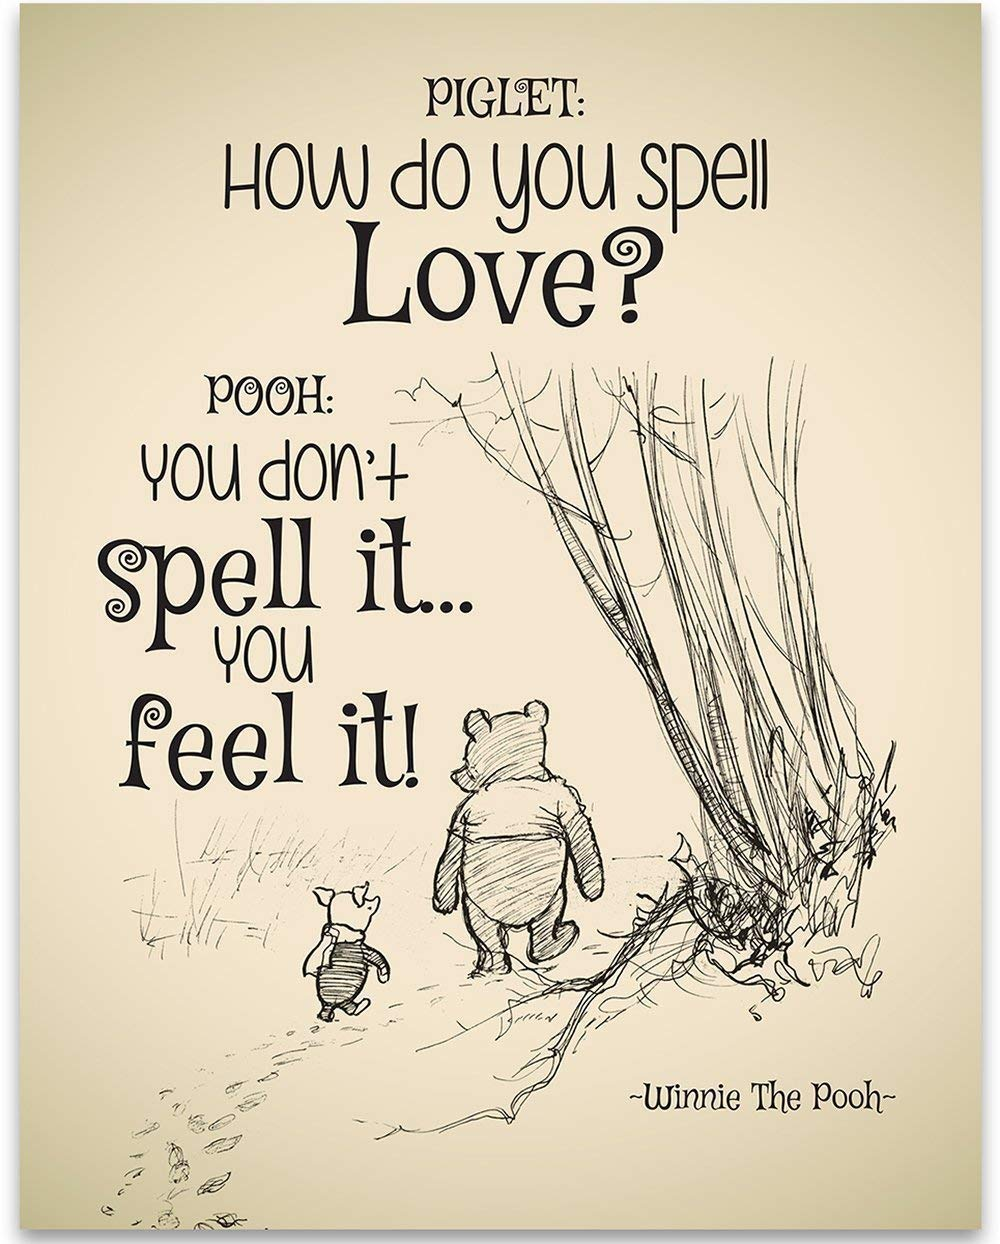 How Do You Spell Love? - Winnie The Pooh - 11x14 Unframed Art Print - Great Child/Boy/Girl/Nursery Room Decor